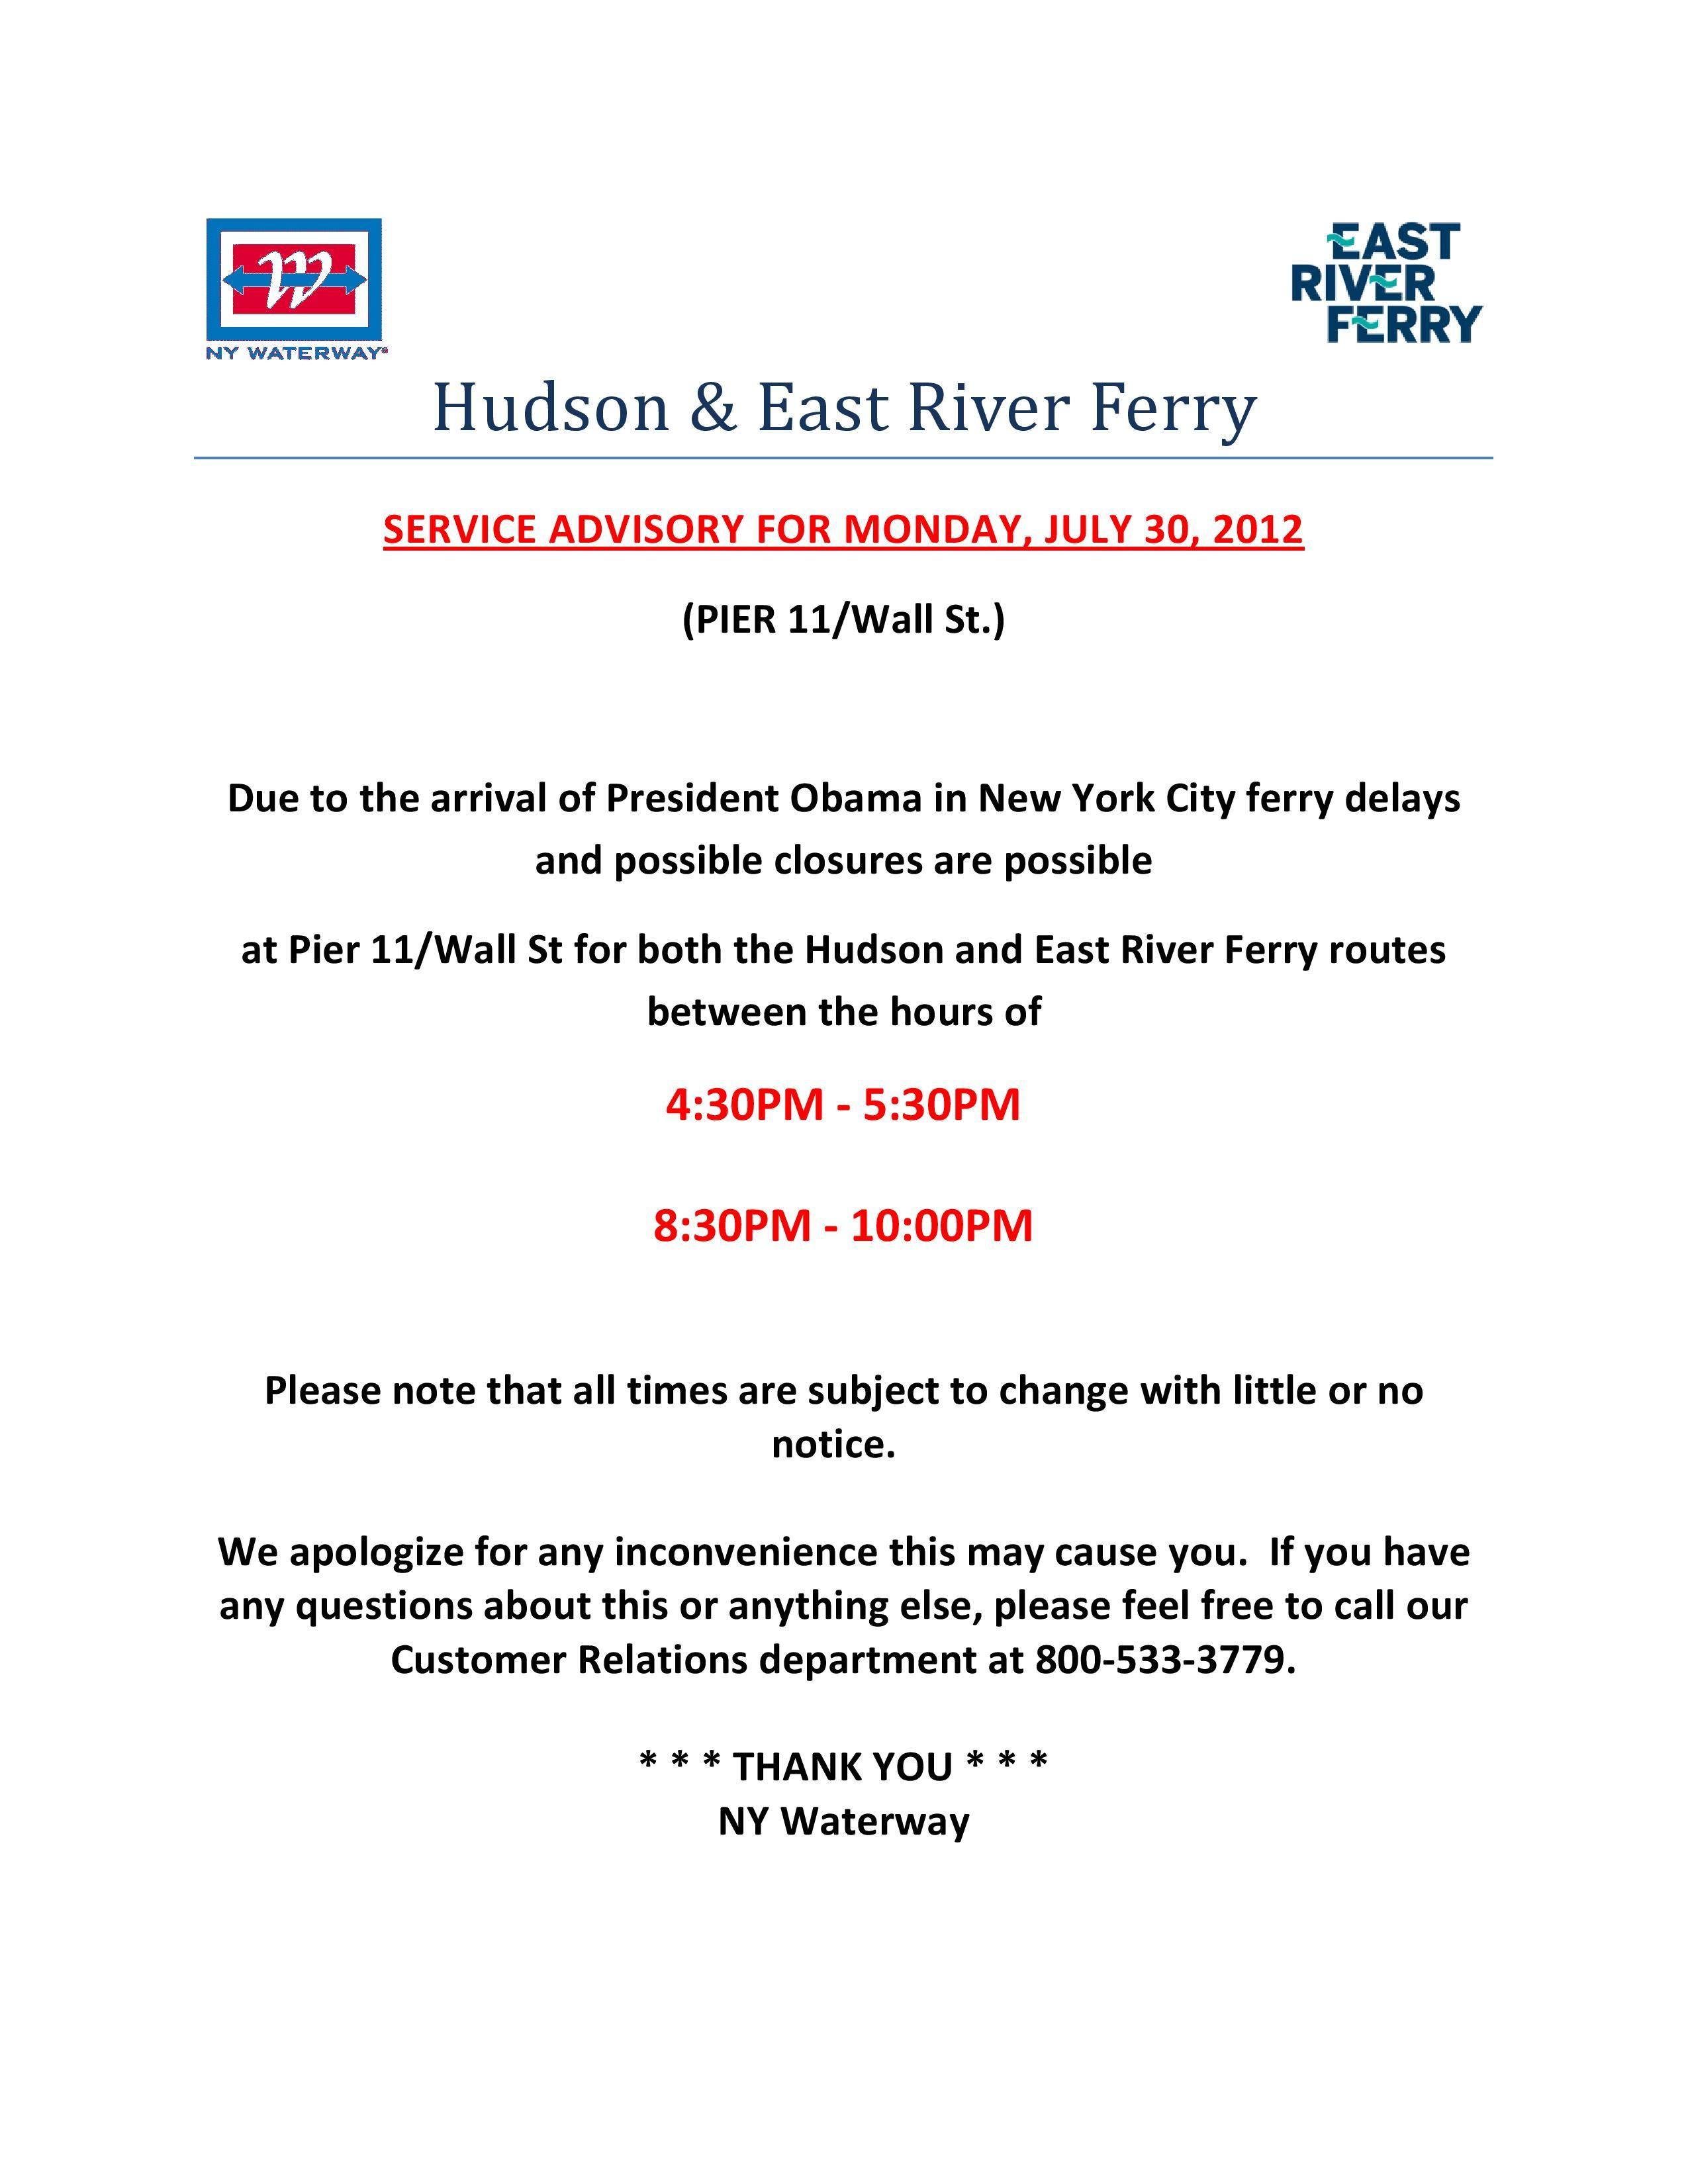 Pier 11 Presidential Security Advisory NYC | NY Waterway